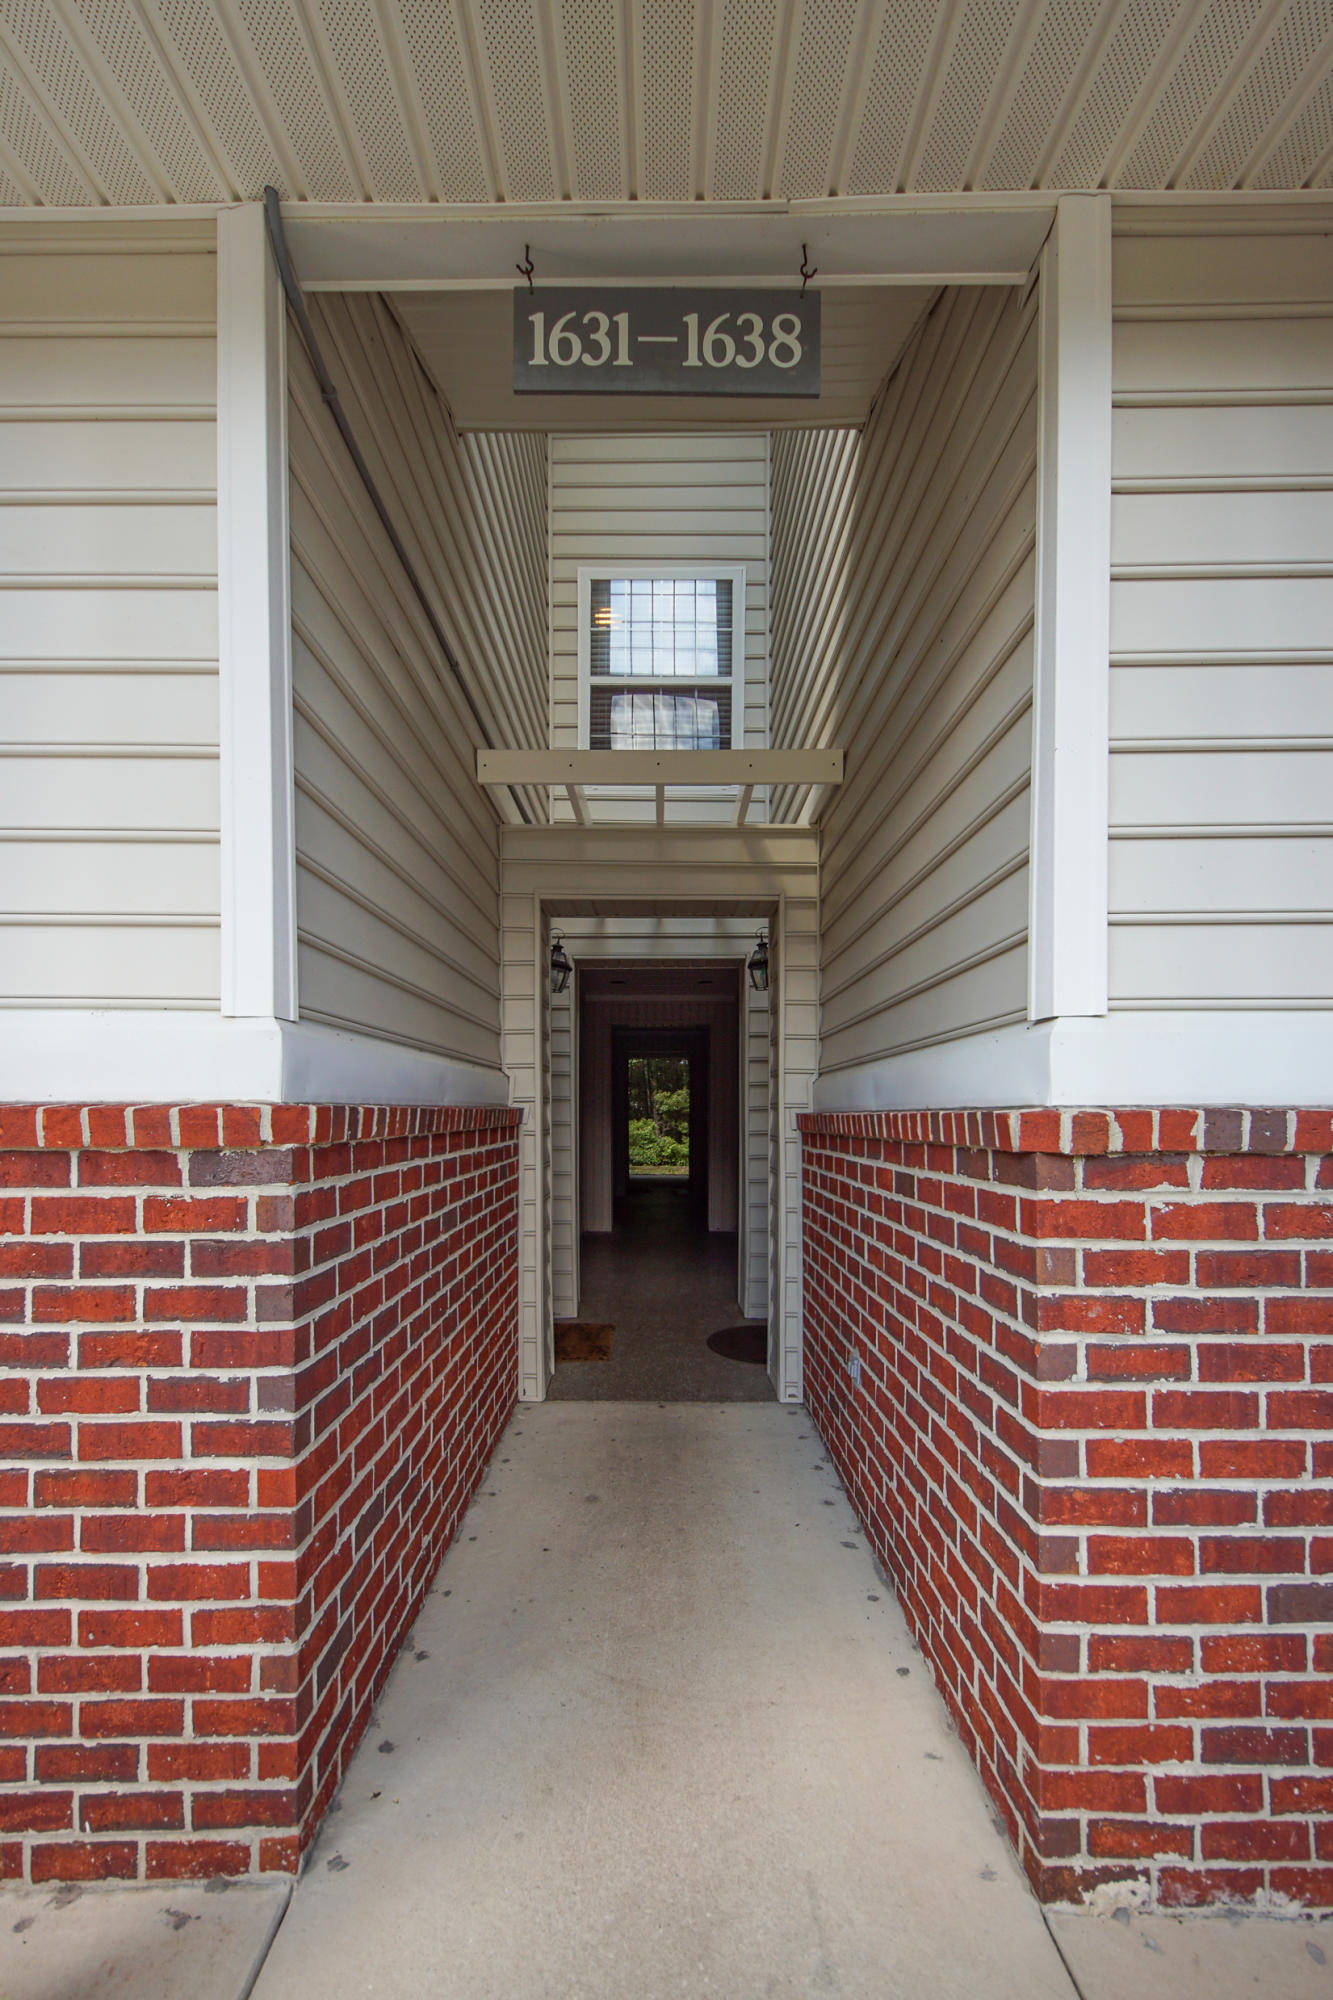 Dunes West Homes For Sale - 1631 Camfield, Mount Pleasant, SC - 16